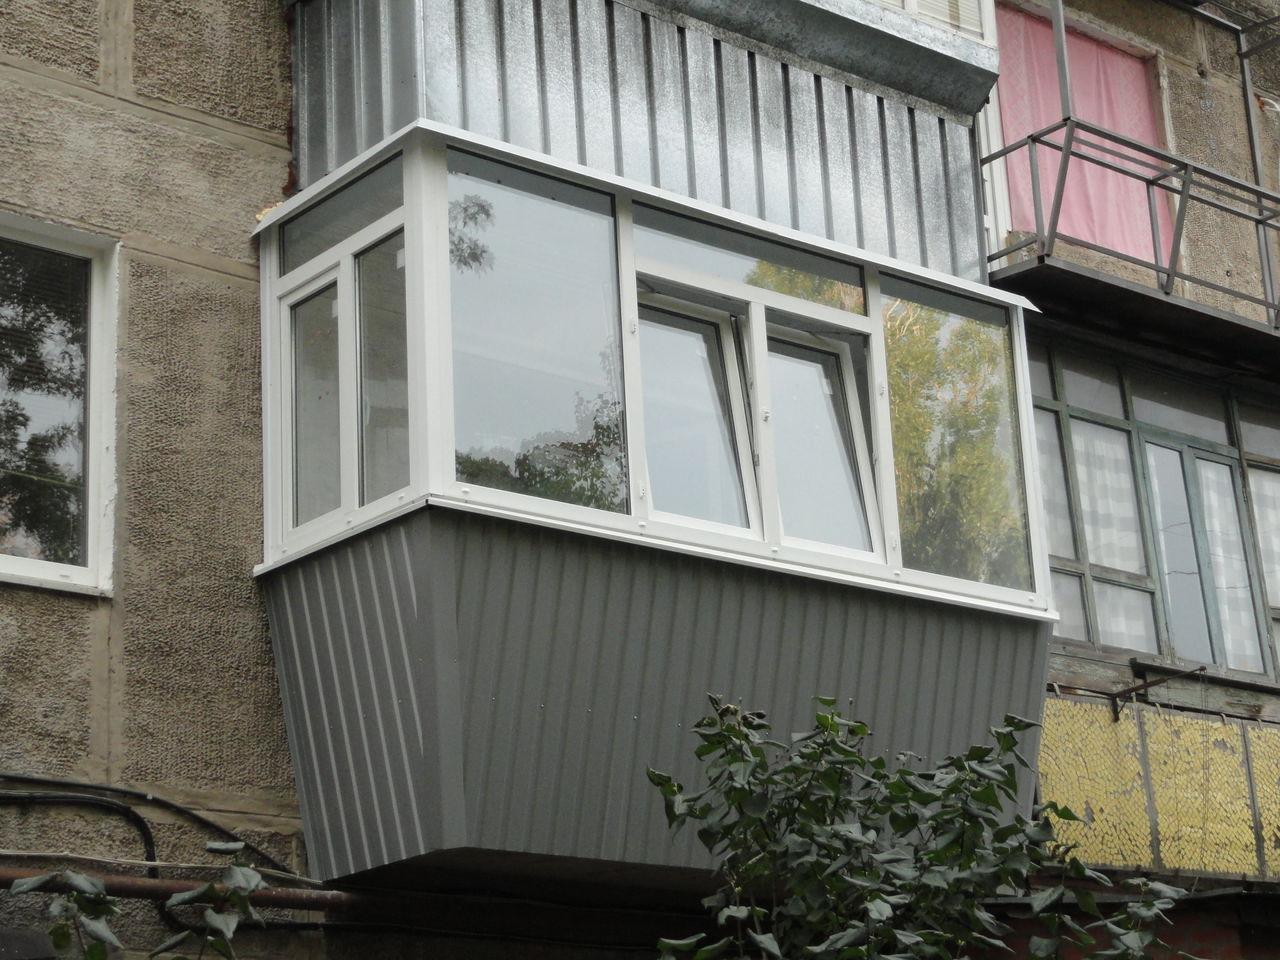 Modern Glazing for Balcony or Loggia. Original form of the balcony for the conveneint apartment